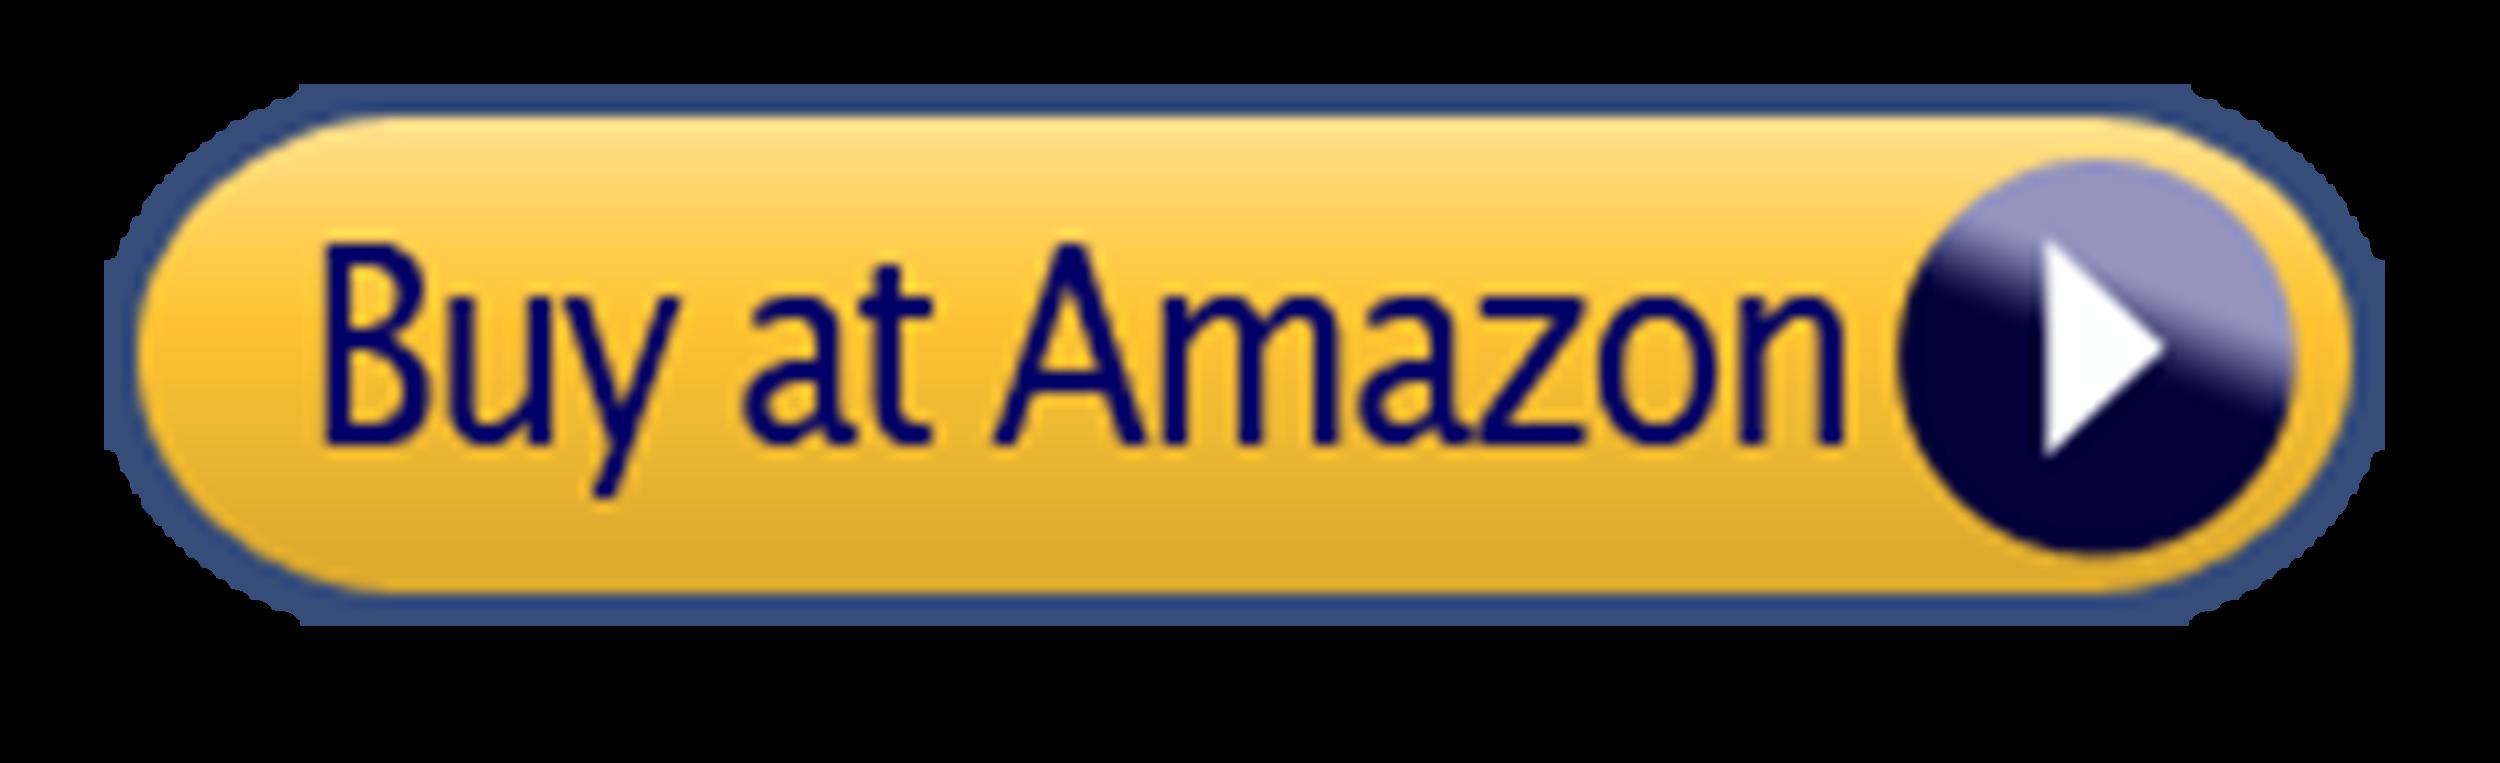 46281775New amazon buy button.jpg